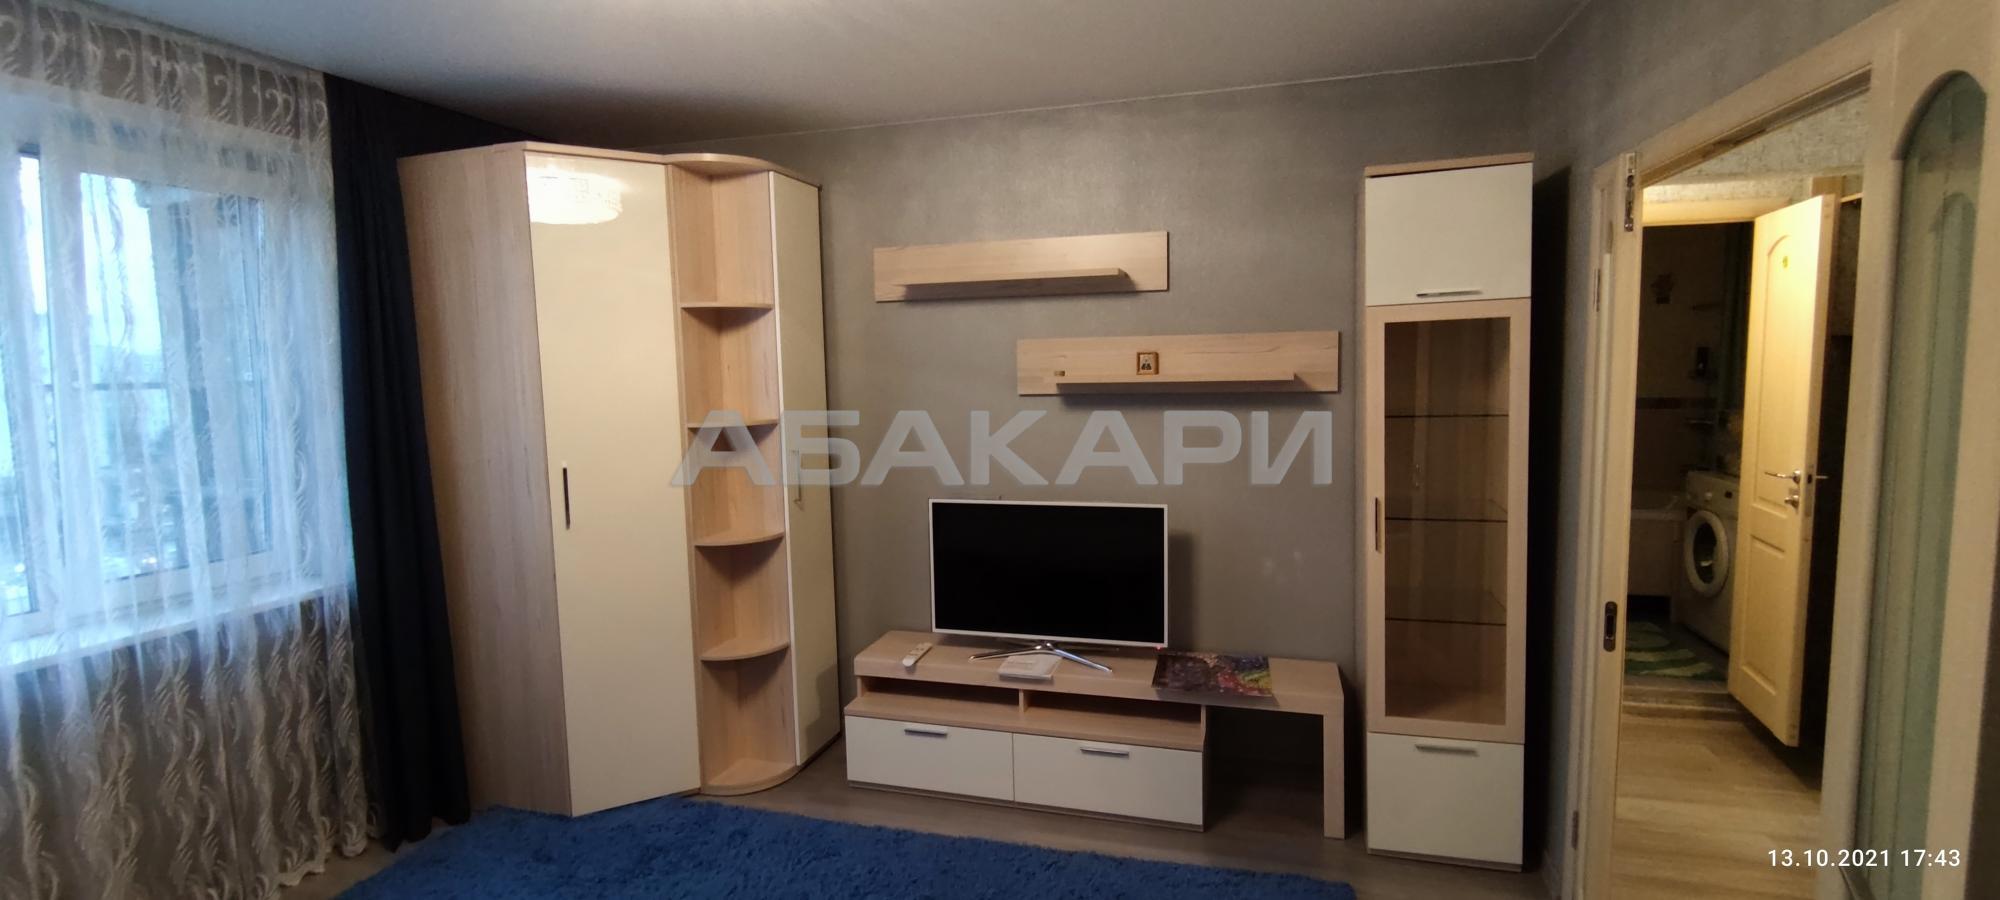 2к квартира проспект Металлургов, 55 а 8/10 - 60кв   30000   аренда в Красноярске фото 1